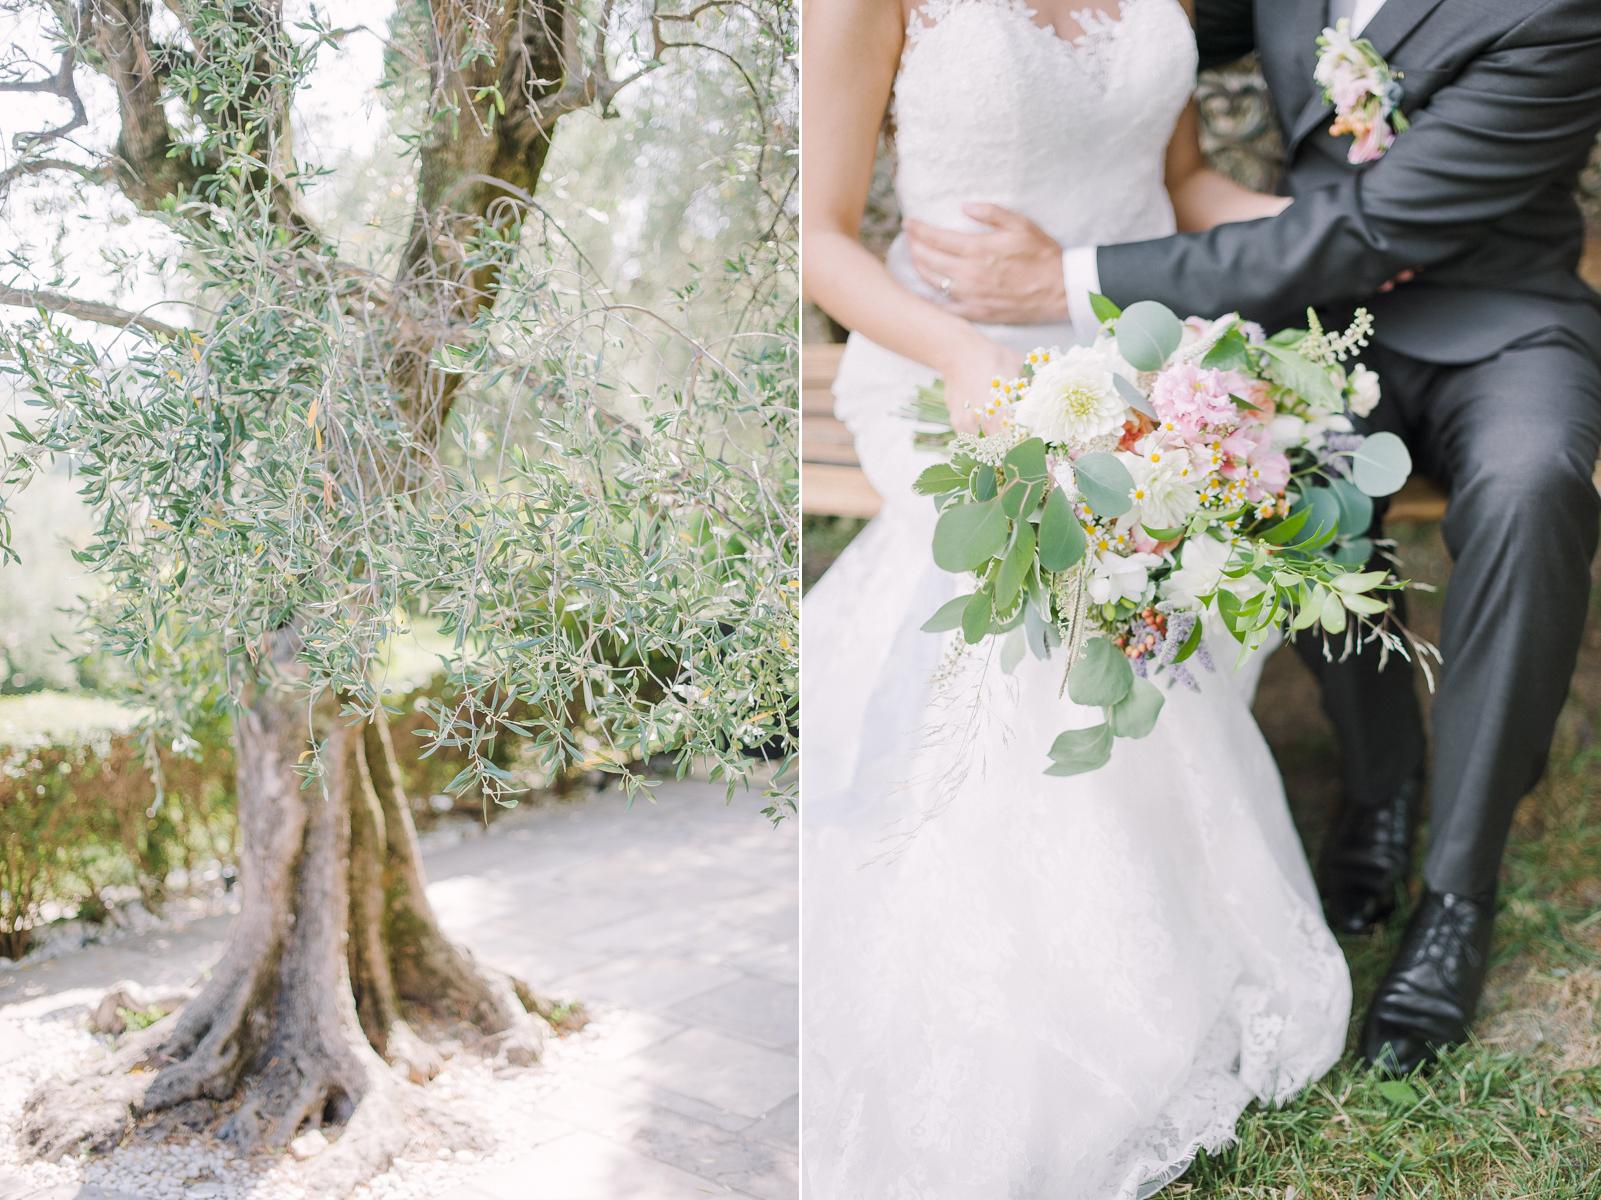 BohemeMoonPhotography-Grasse-provence-wedding-photographer_14.jpg